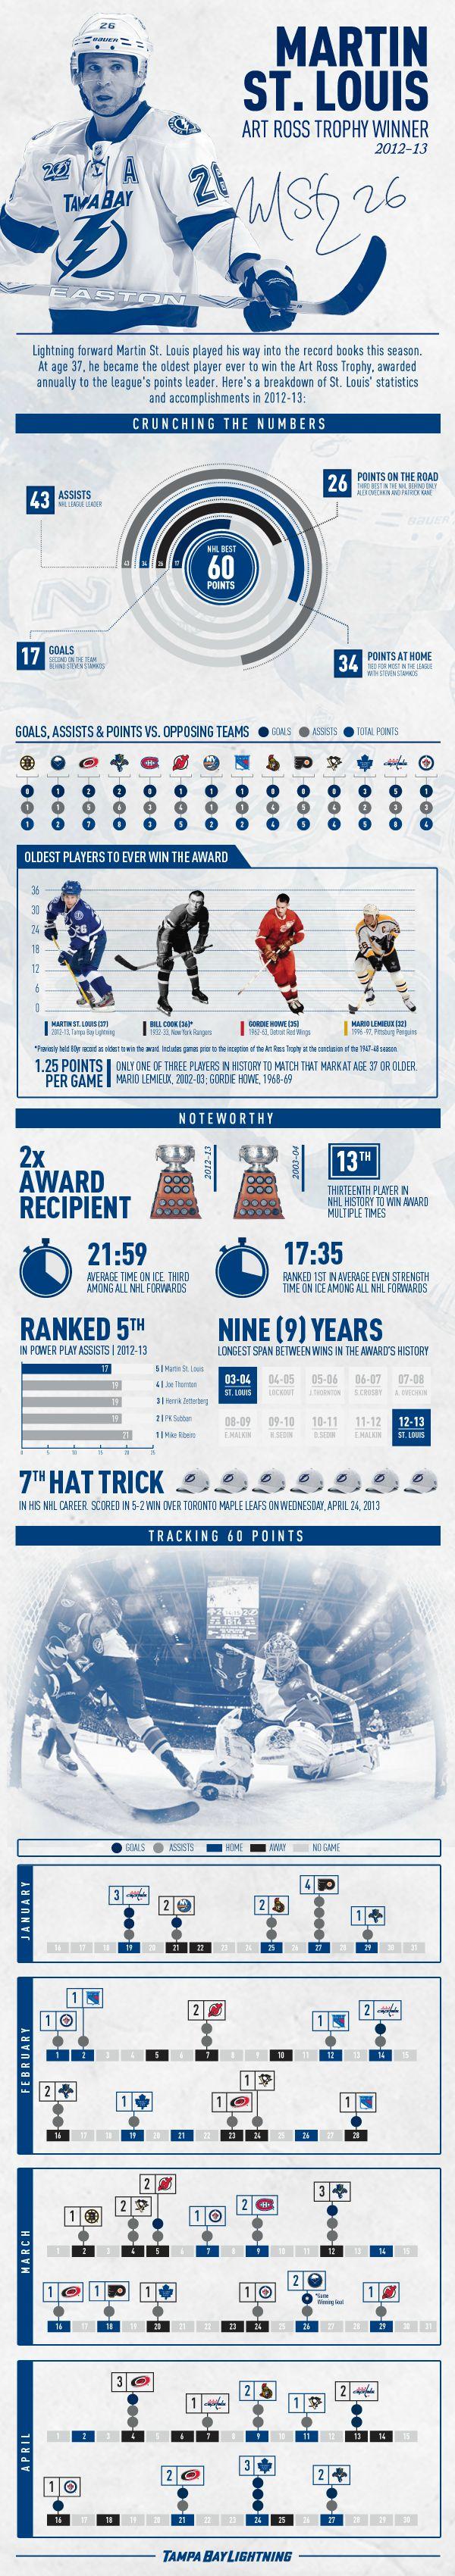 Martin St. Louis: Art Ross Trophy winner 2012-2013